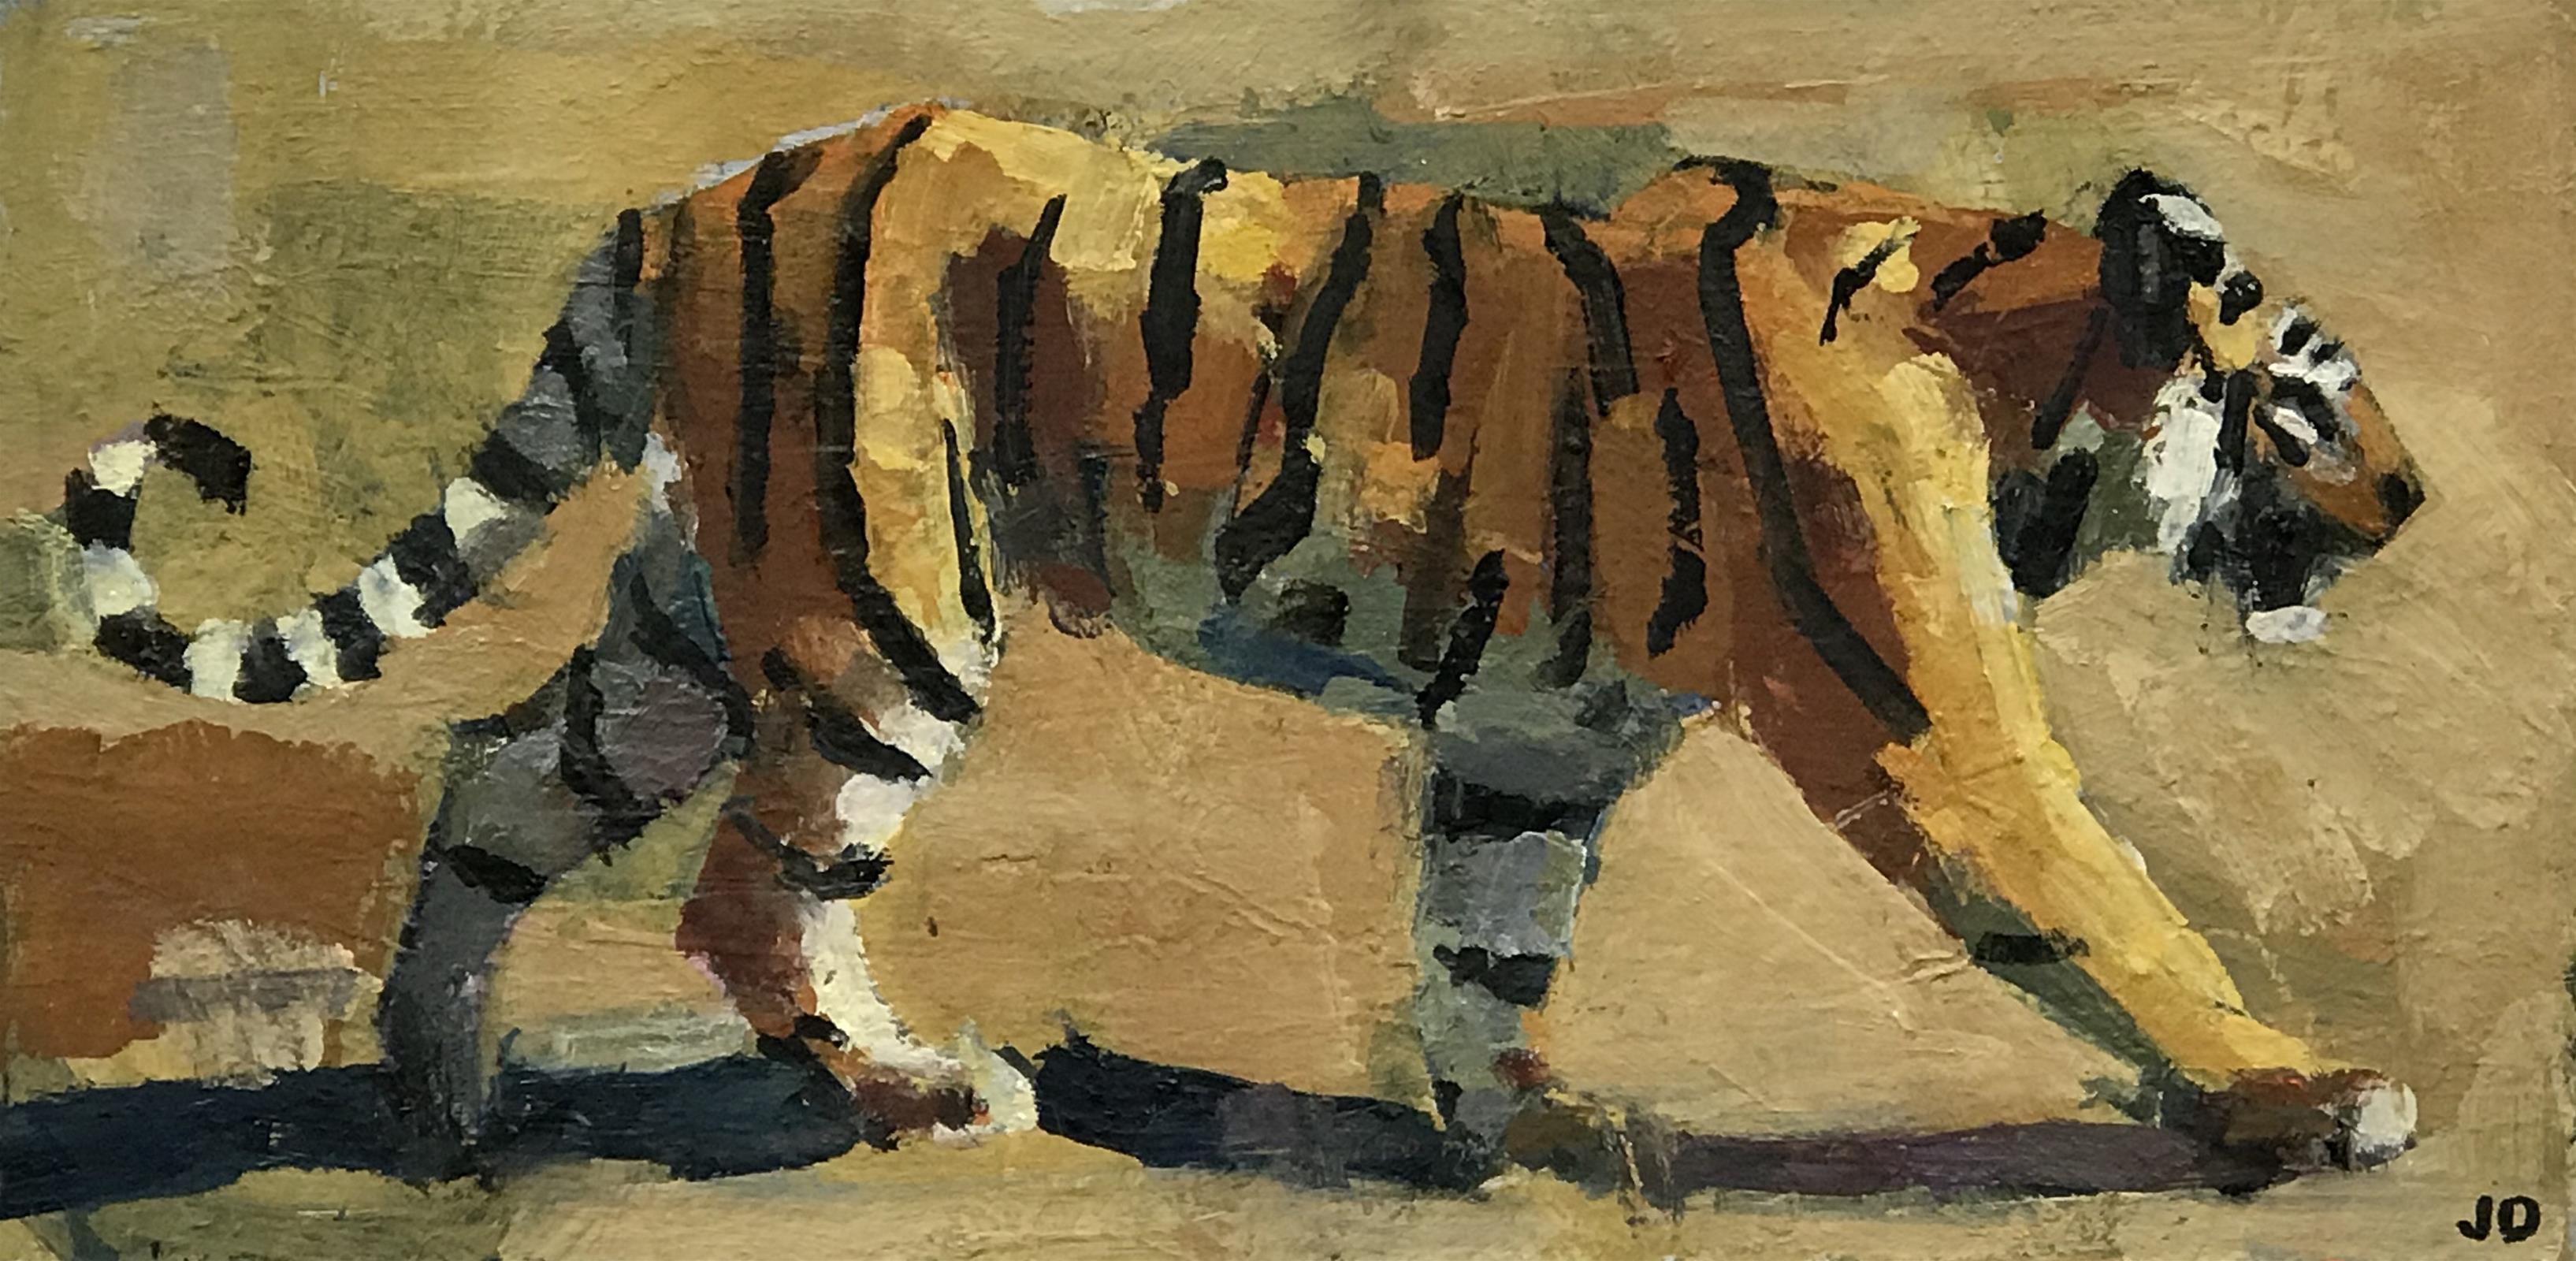 Tiger by John Dobbs